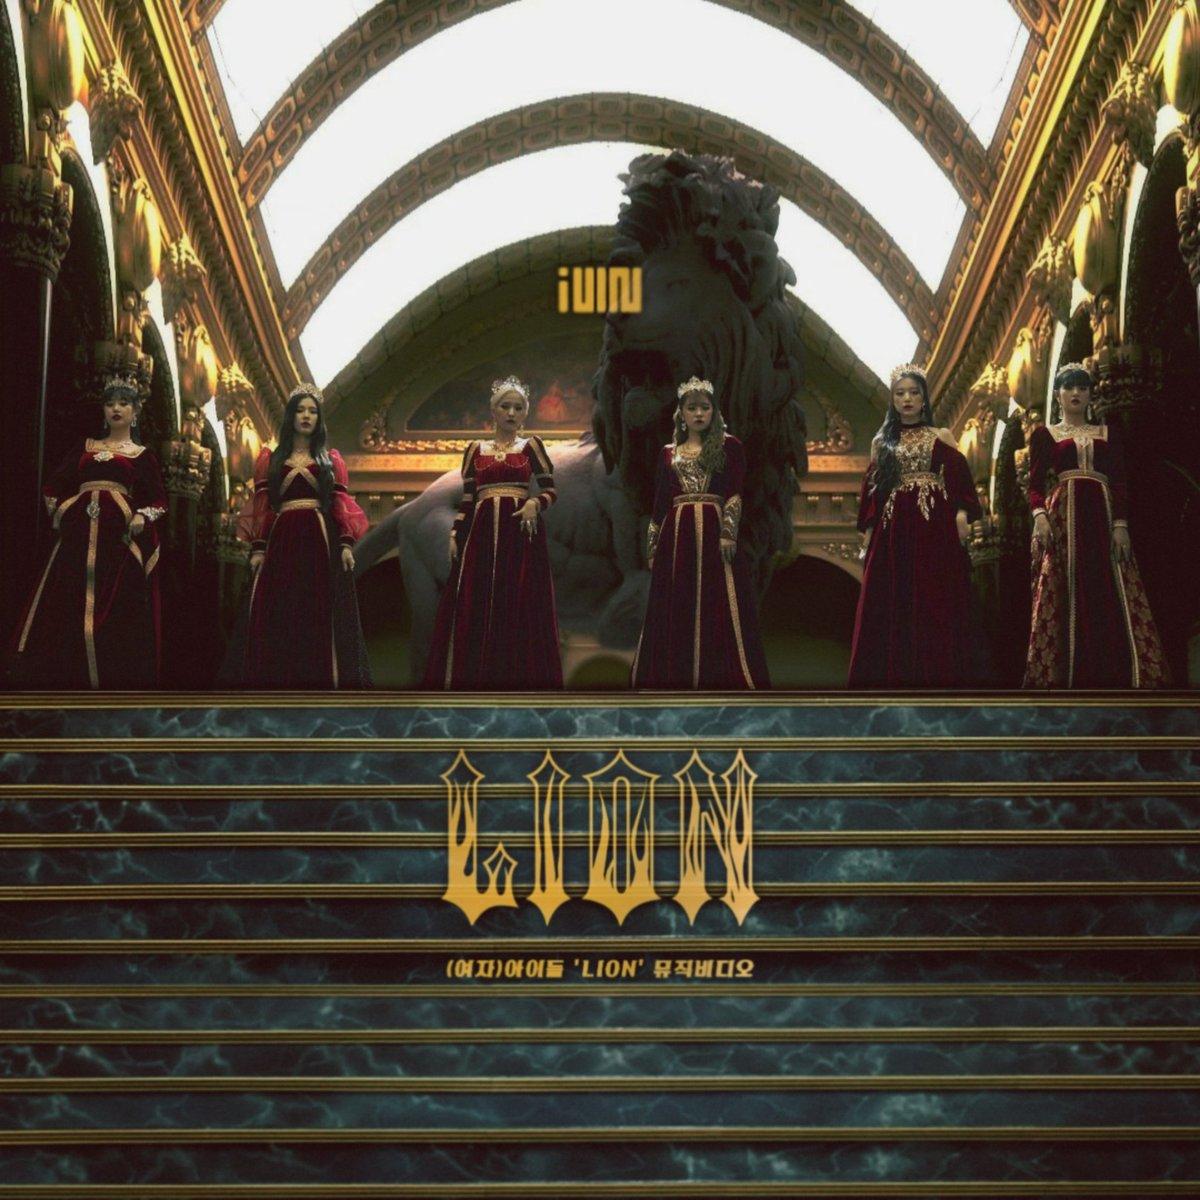 (G)I-DLE LION - album cover  Watch on my deviantart : https://www.deviantart.com/lealbum  #GIDLE #LION #QUEENDOM pic.twitter.com/hGaYtjgUBT